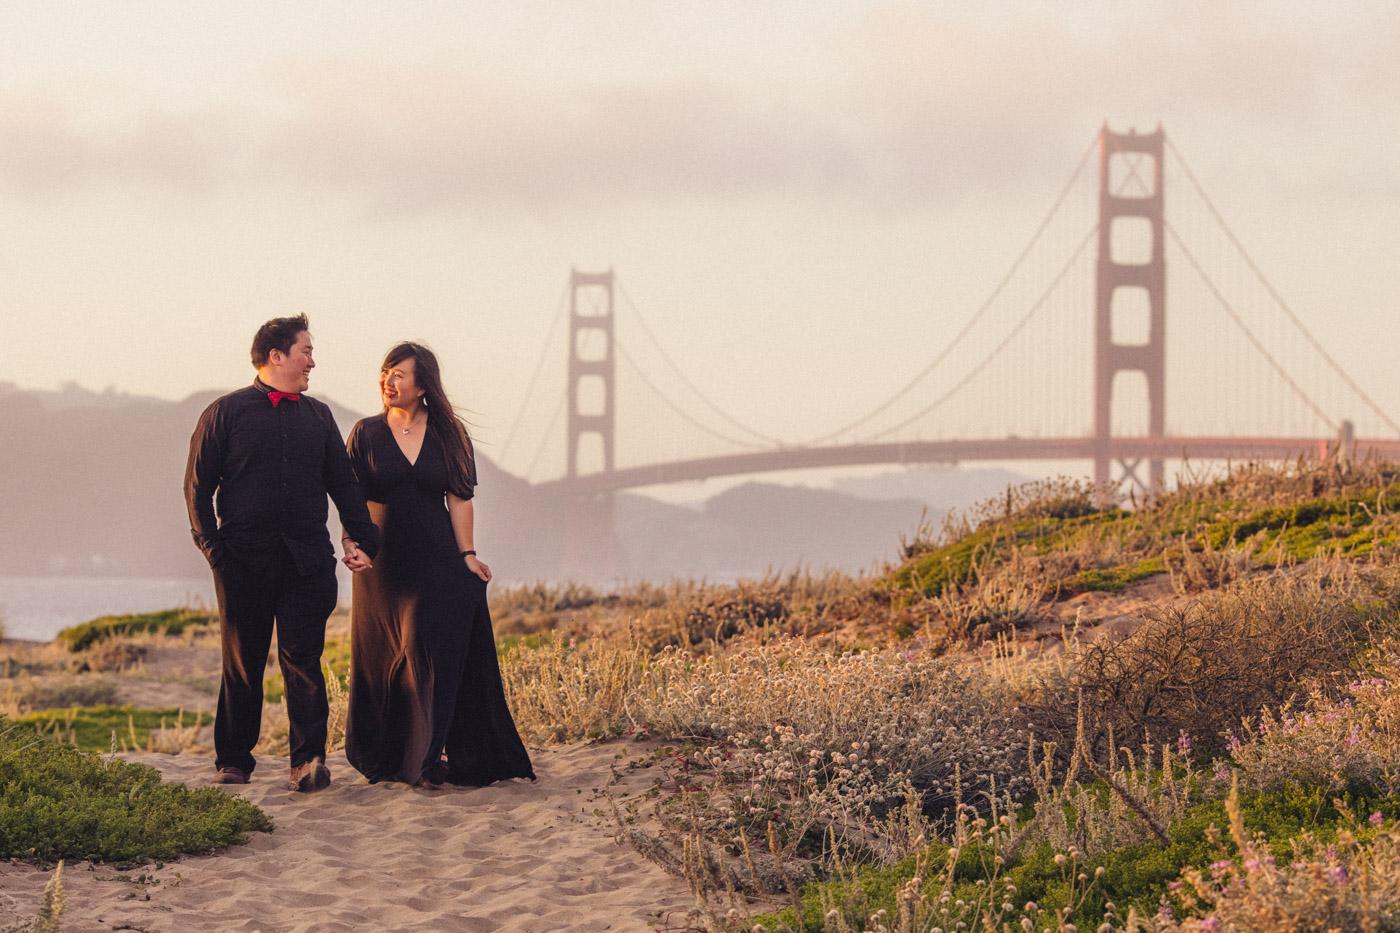 aaron-kes-photography-golden-gate-bridge-engagement-session